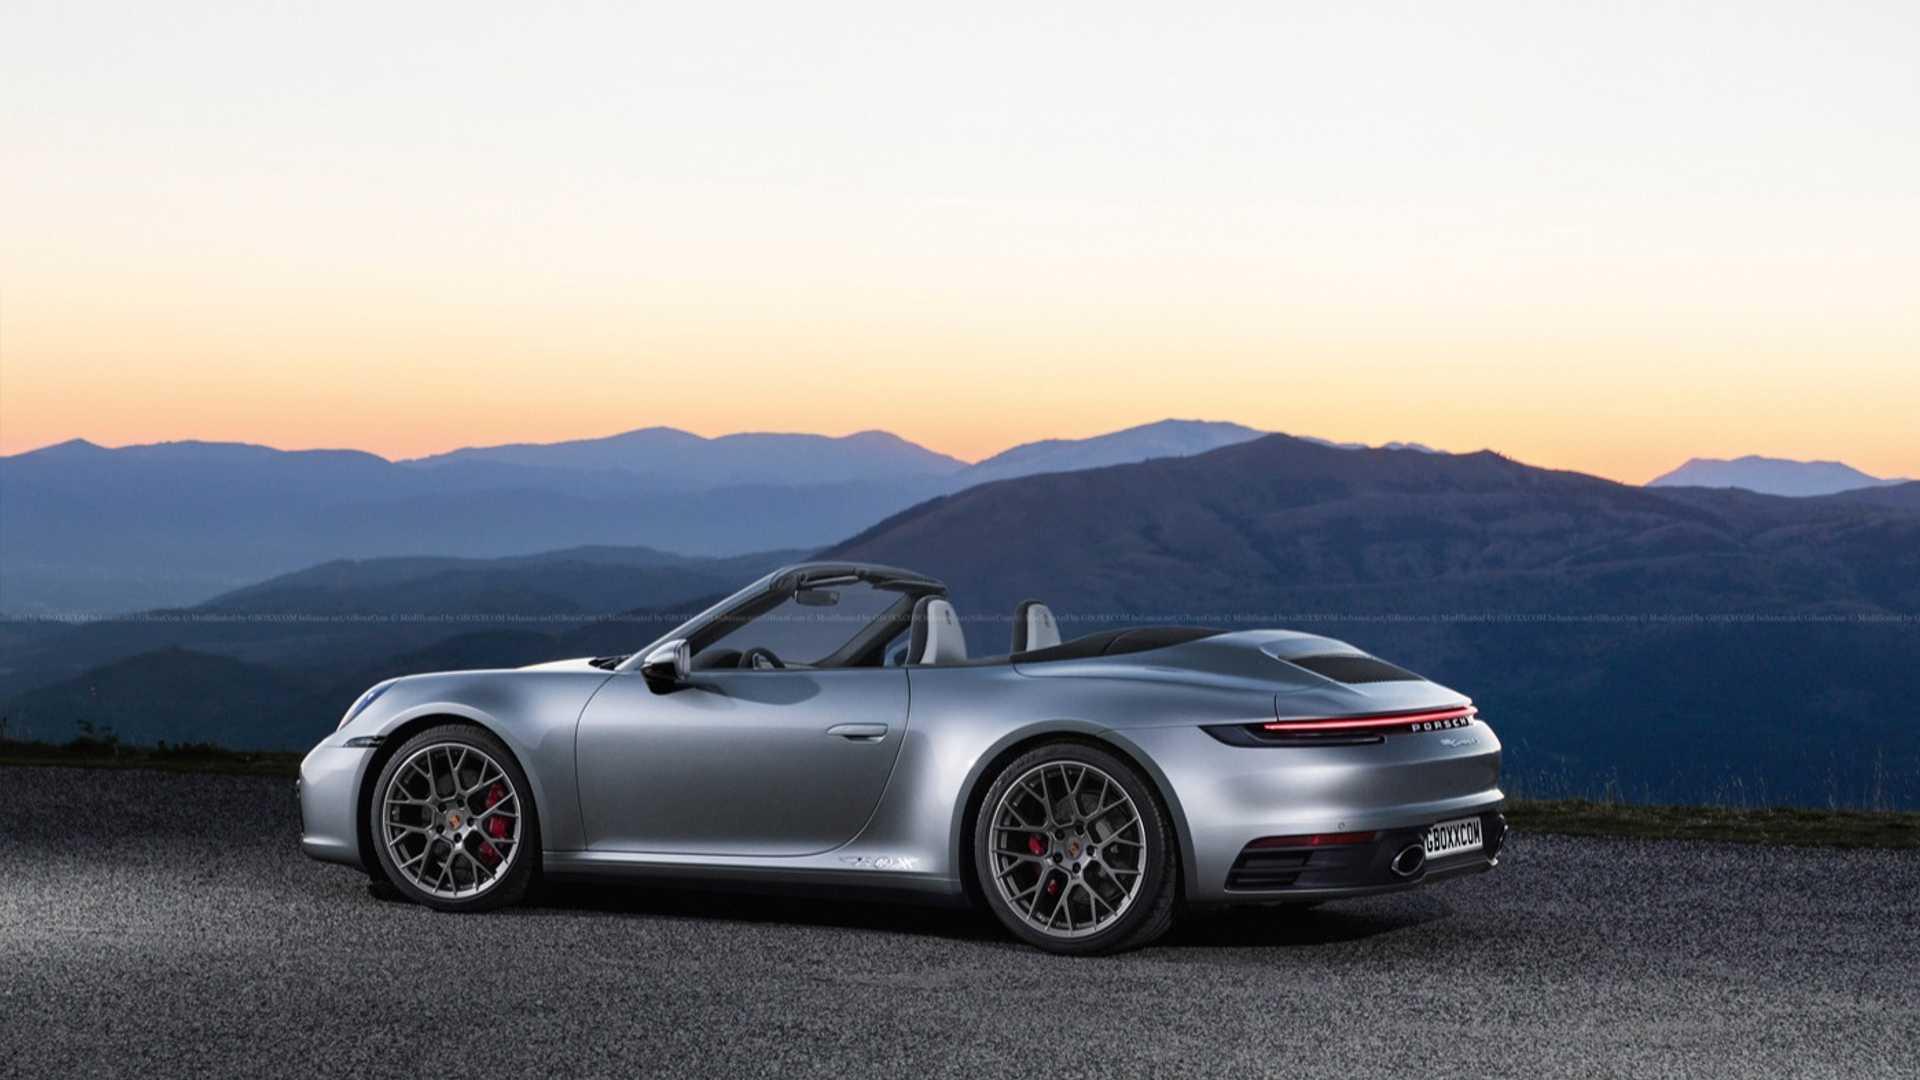 36 Concept of 2020 Porsche Speedster Review with 2020 Porsche Speedster